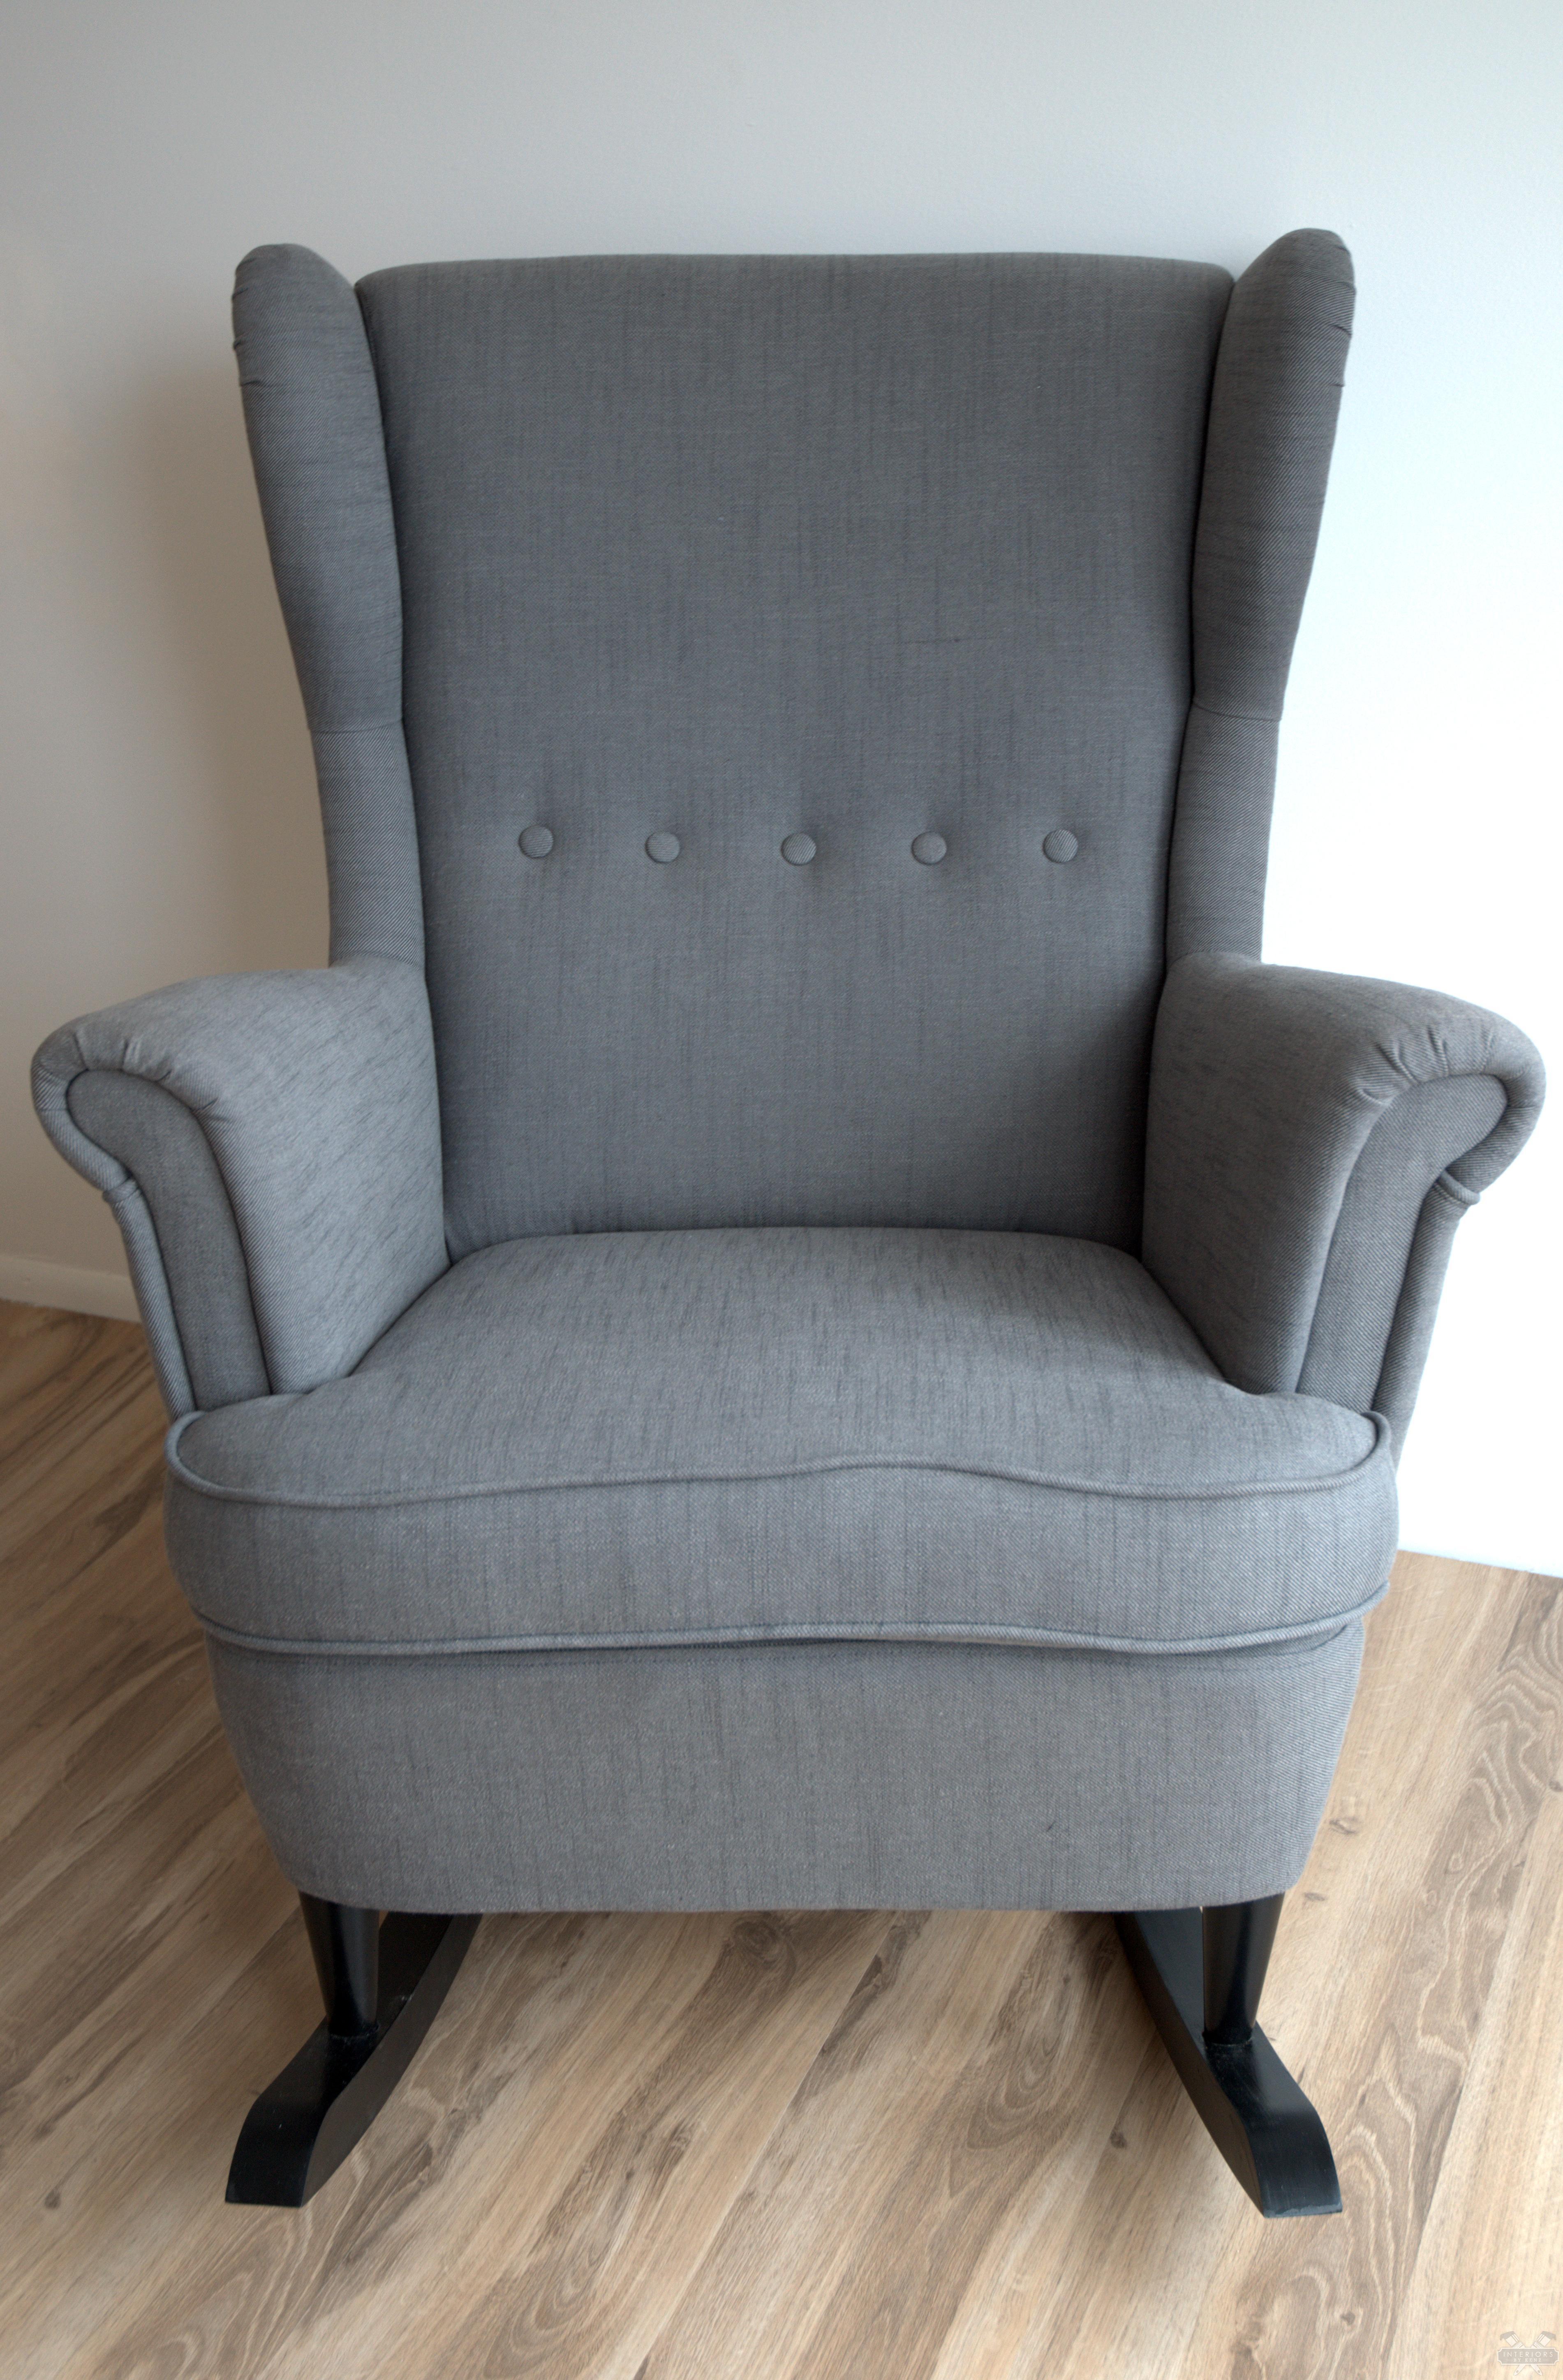 Ikea Hack Strandmon Rocker Diy Wingback Rocking Chair Interiors By Kenz On Listly